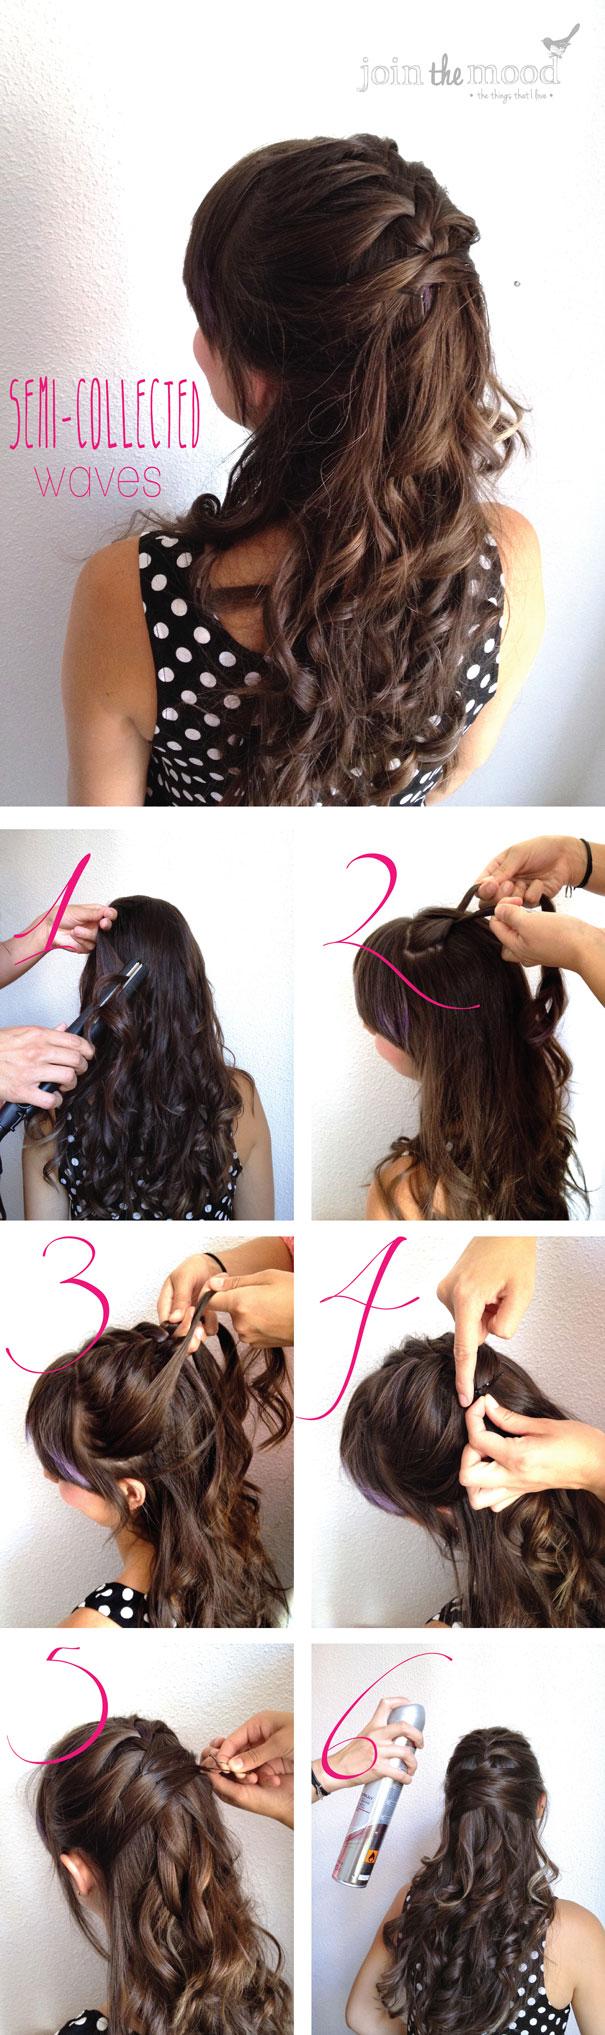 Phenomenal 13 Half Up Half Down Hair Tutorials Hairstyle Inspiration Daily Dogsangcom